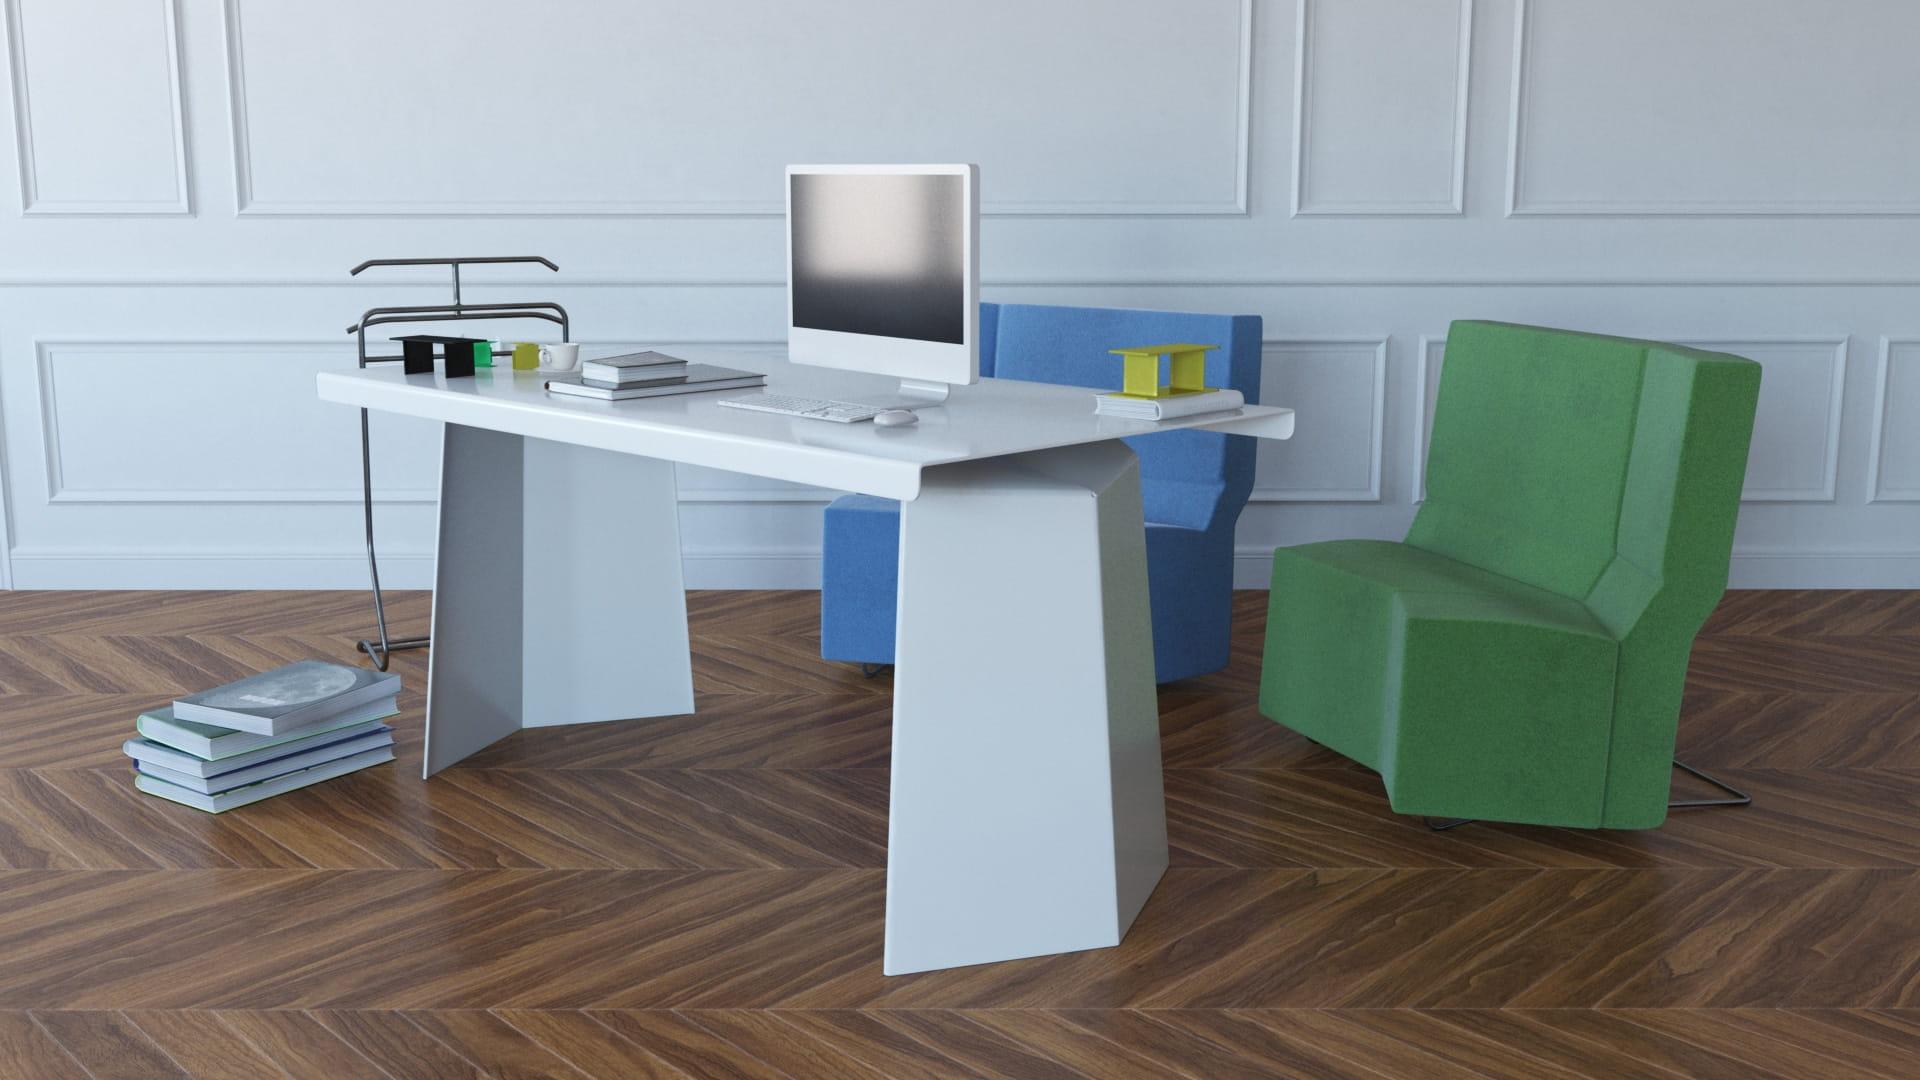 furniture set 5 AM253